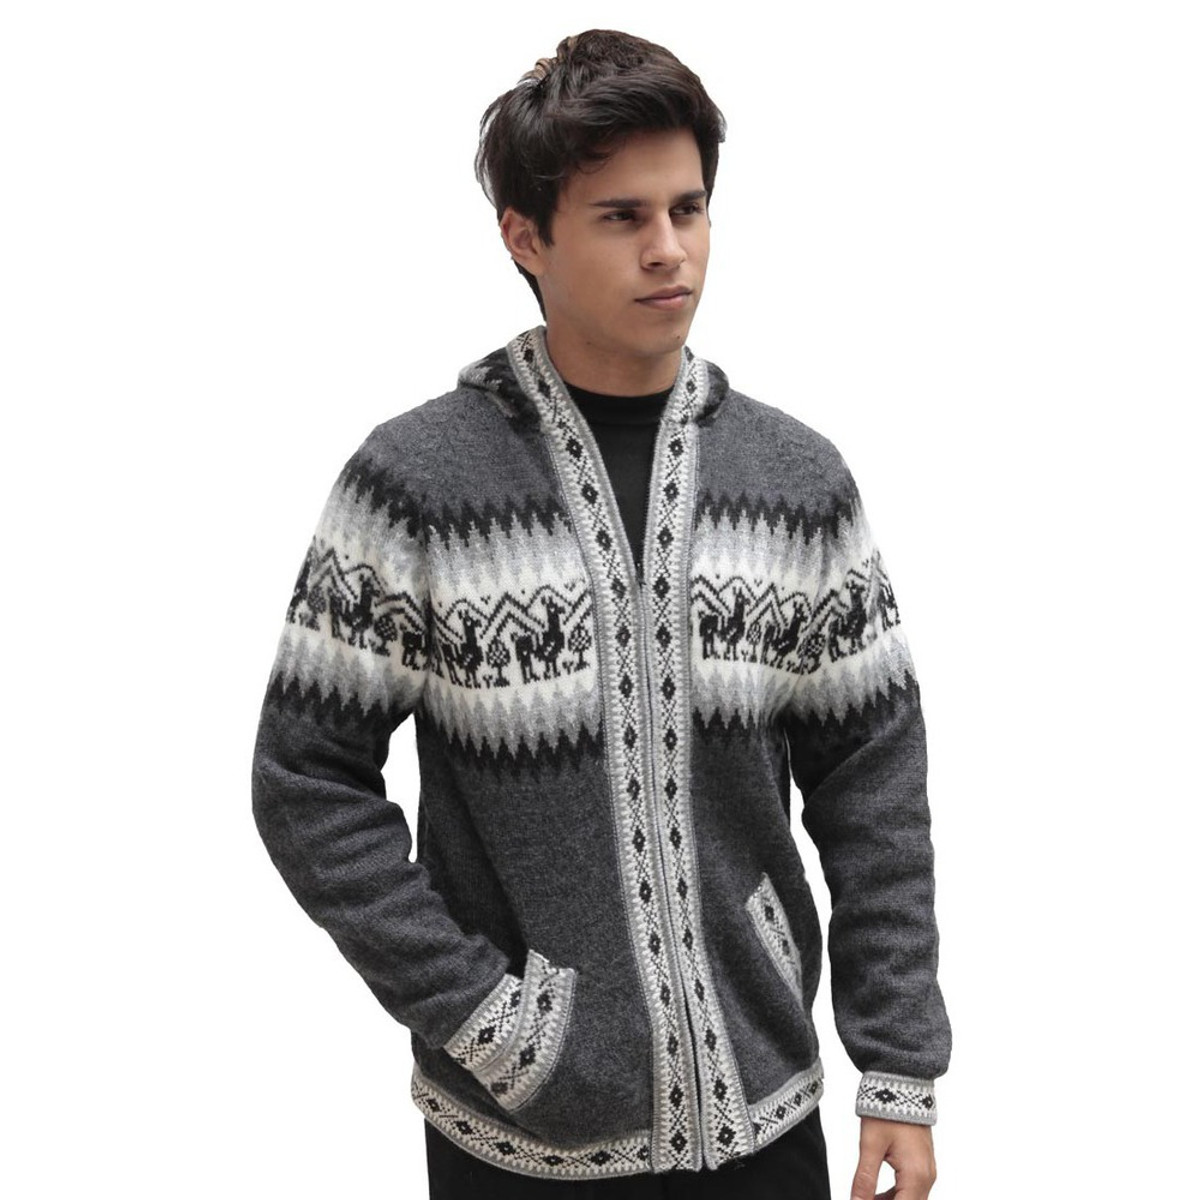 80229.MRCDKH-52 TrousersAttitude80229 Size Black//Grey 36//32 Black//Charcoal Grey Havep